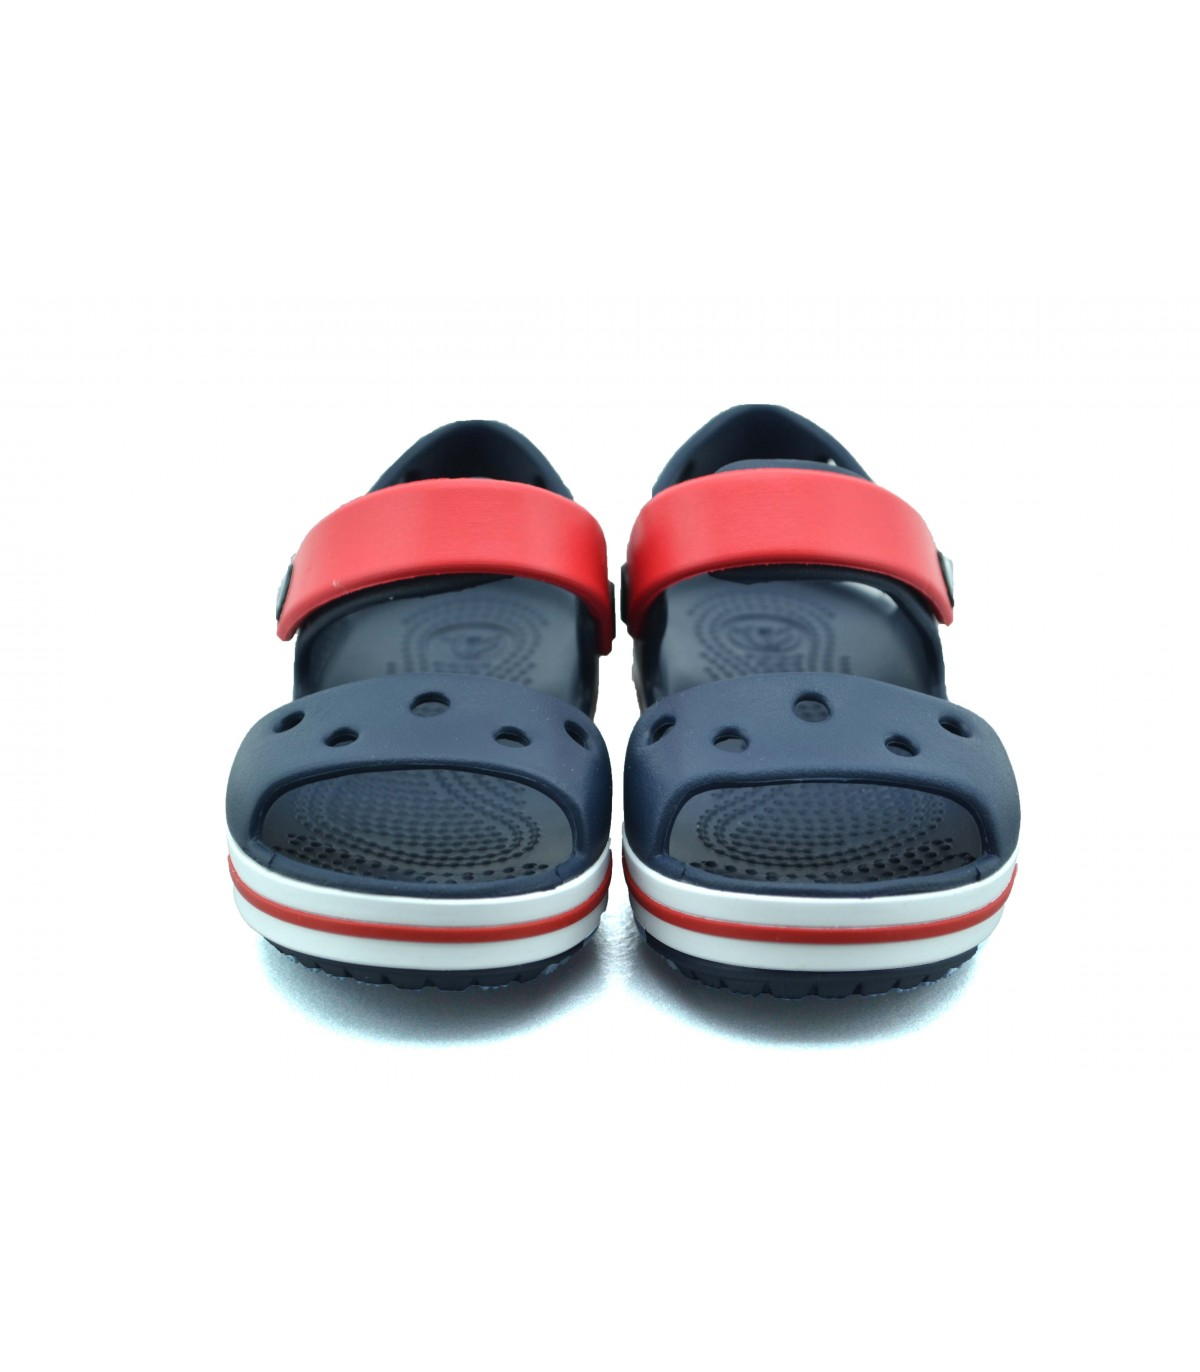 Iupxztwok Niños Sandalias Kzapatos Calzado Online Crocs Crocband 0ym8nwOvNP